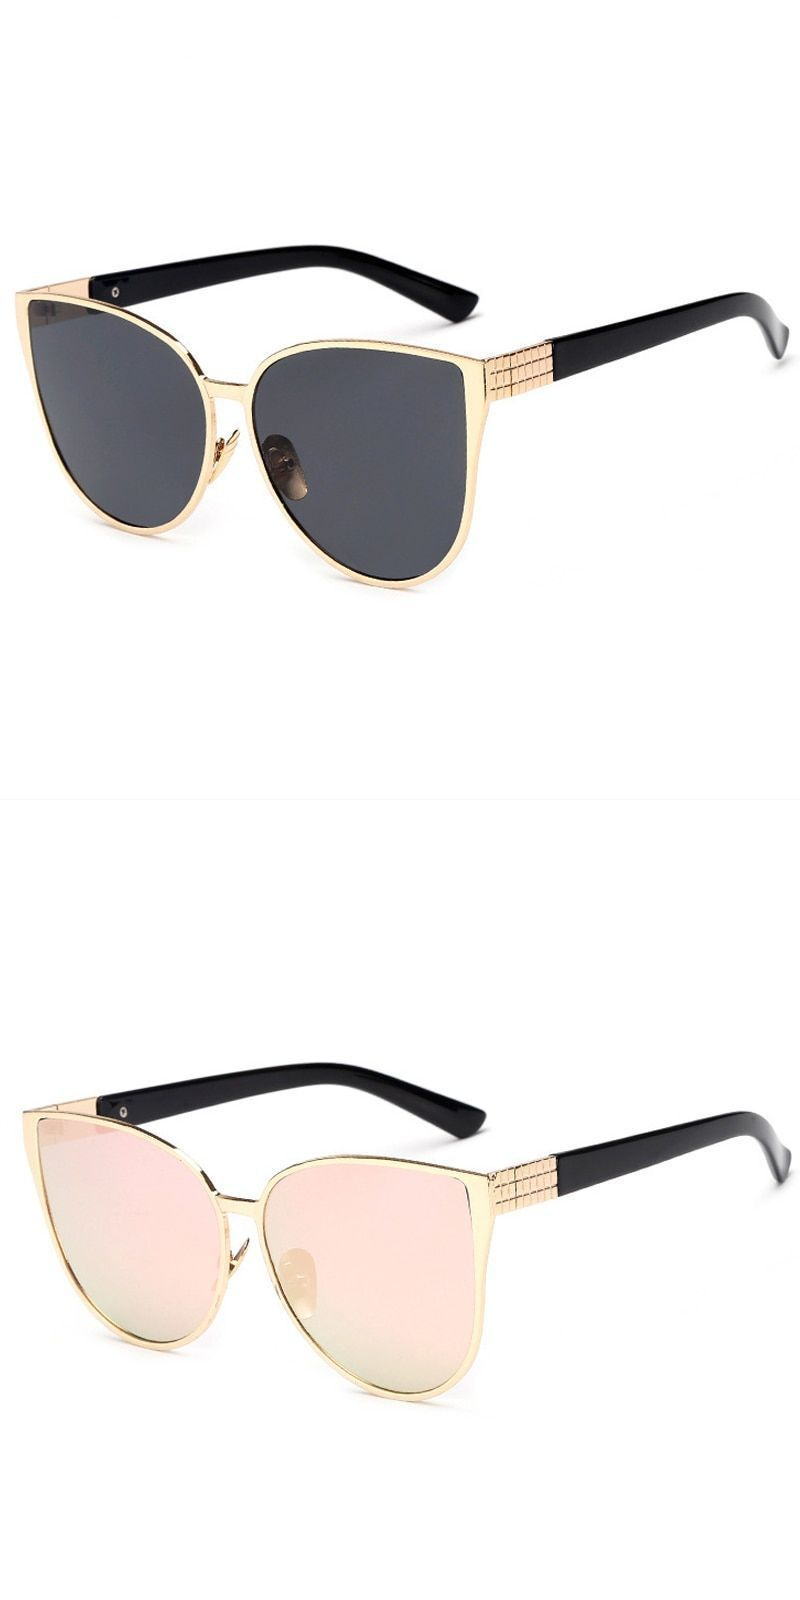 New cat eye sunglasses women fashion summer uv400 oversize style big size  frame mirror sun glasses female oculos  fashion  classic  cool  uv400 ... 7253373ce4